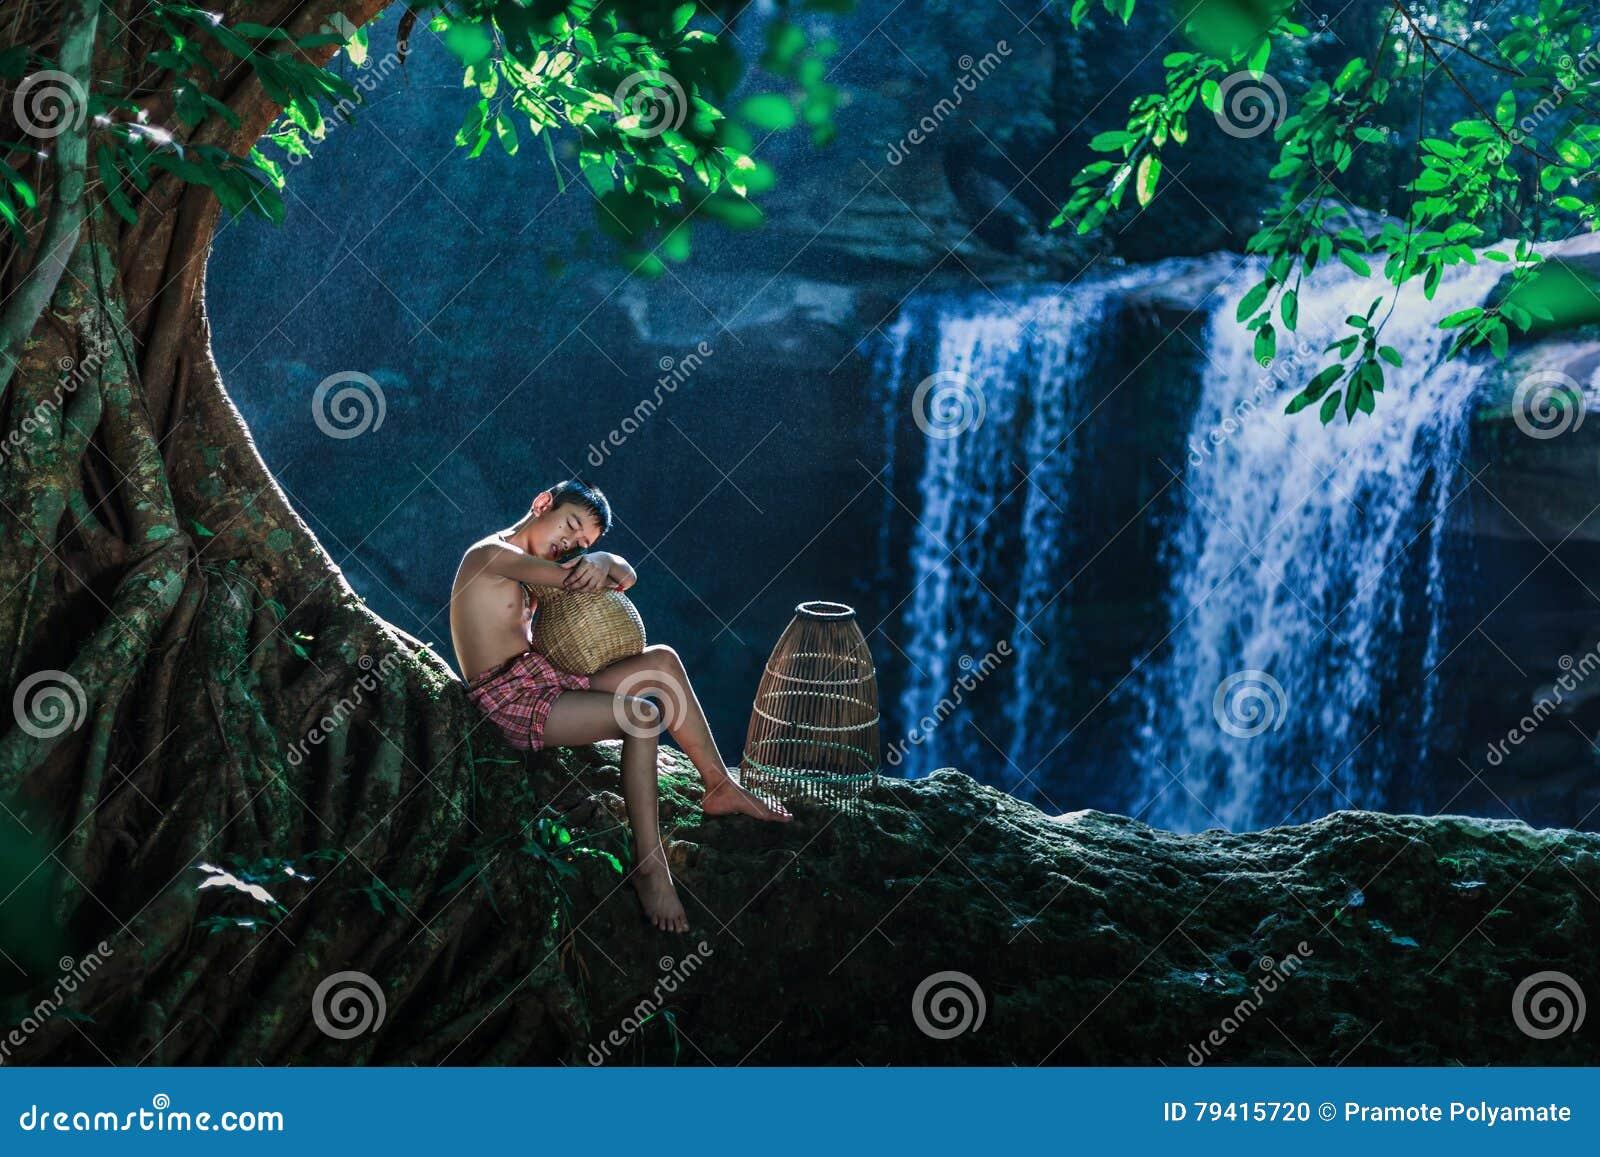 Hildren in rural sit under a tree on the rocks in a waterfall.